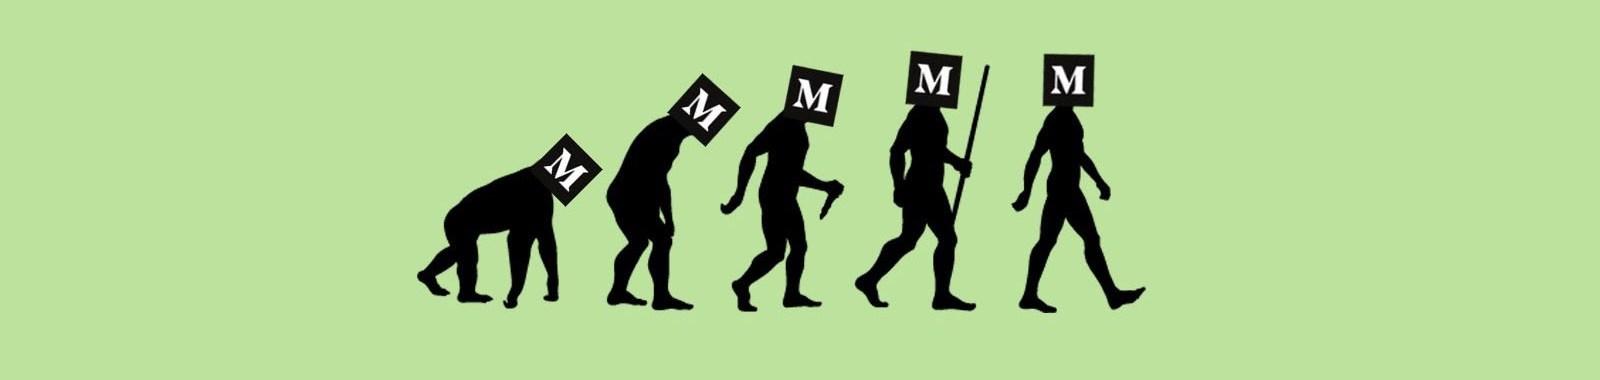 medium-evolution-eye